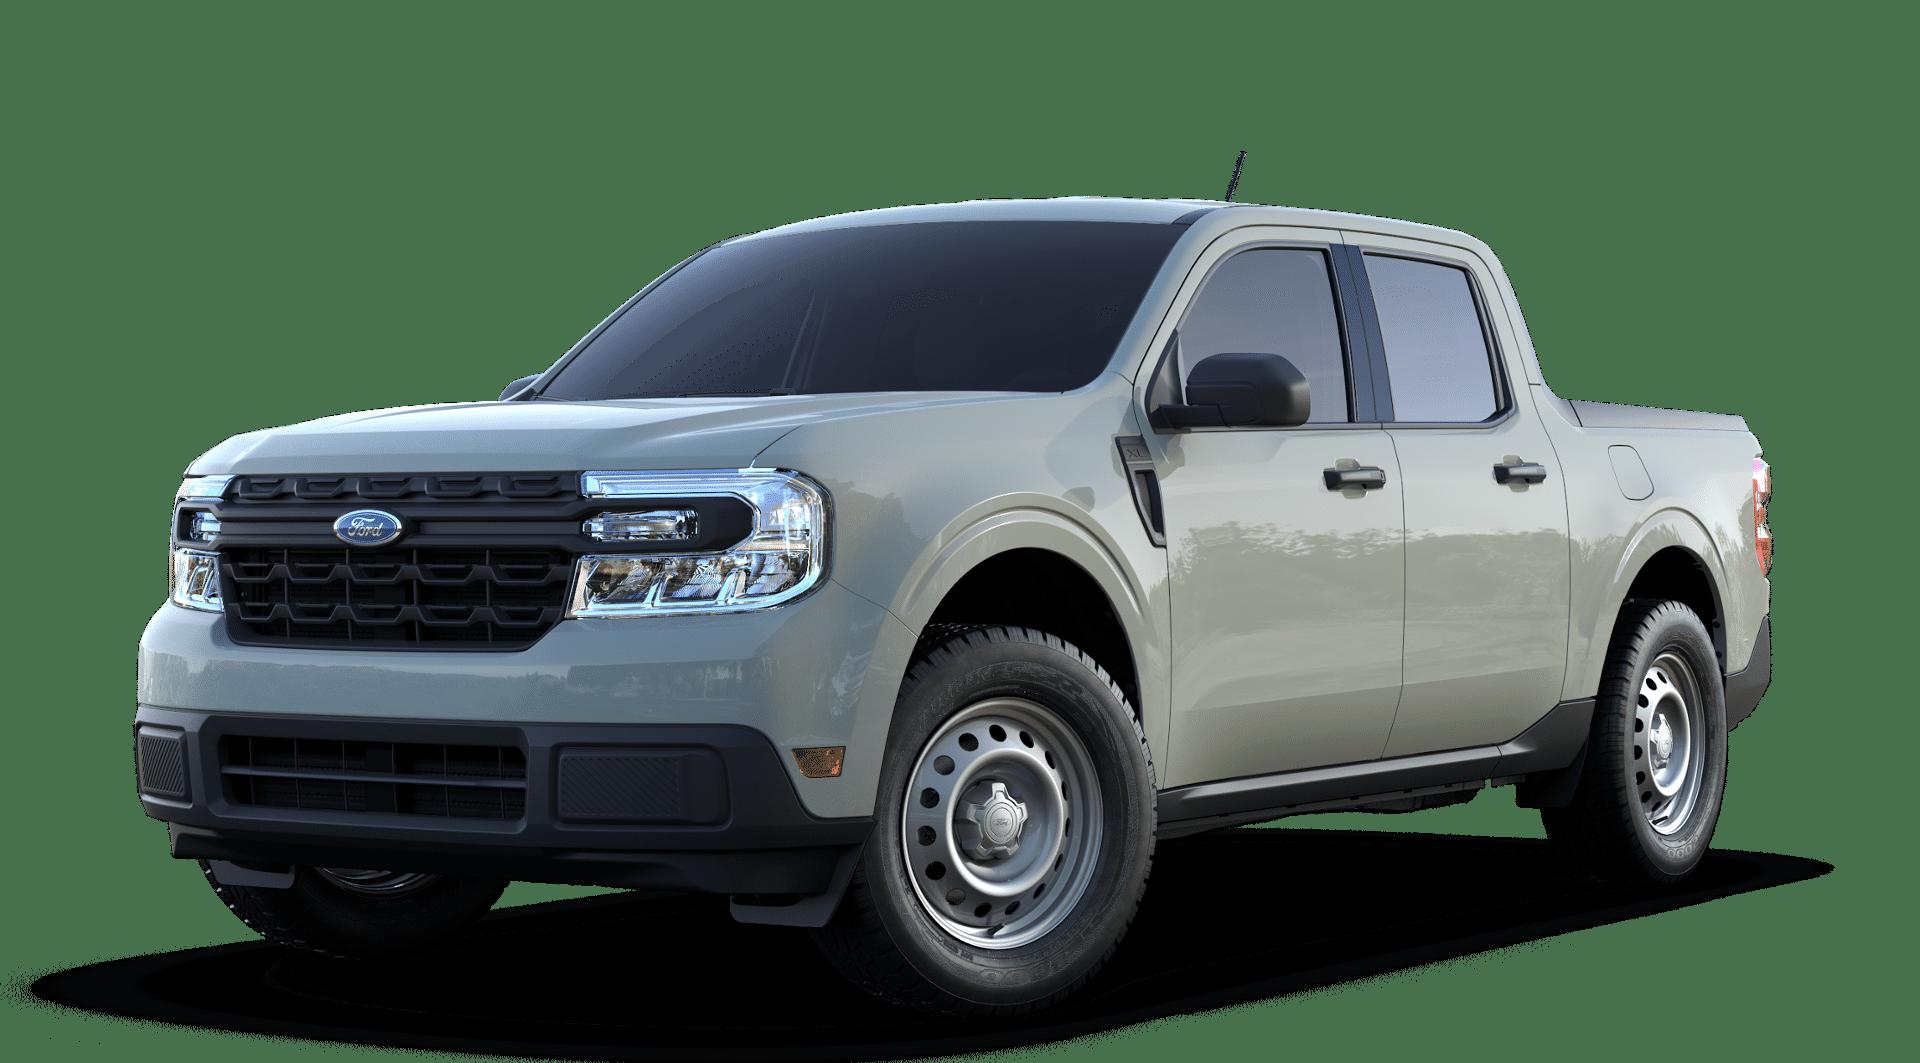 2022 Ford Maverick Collierville TN